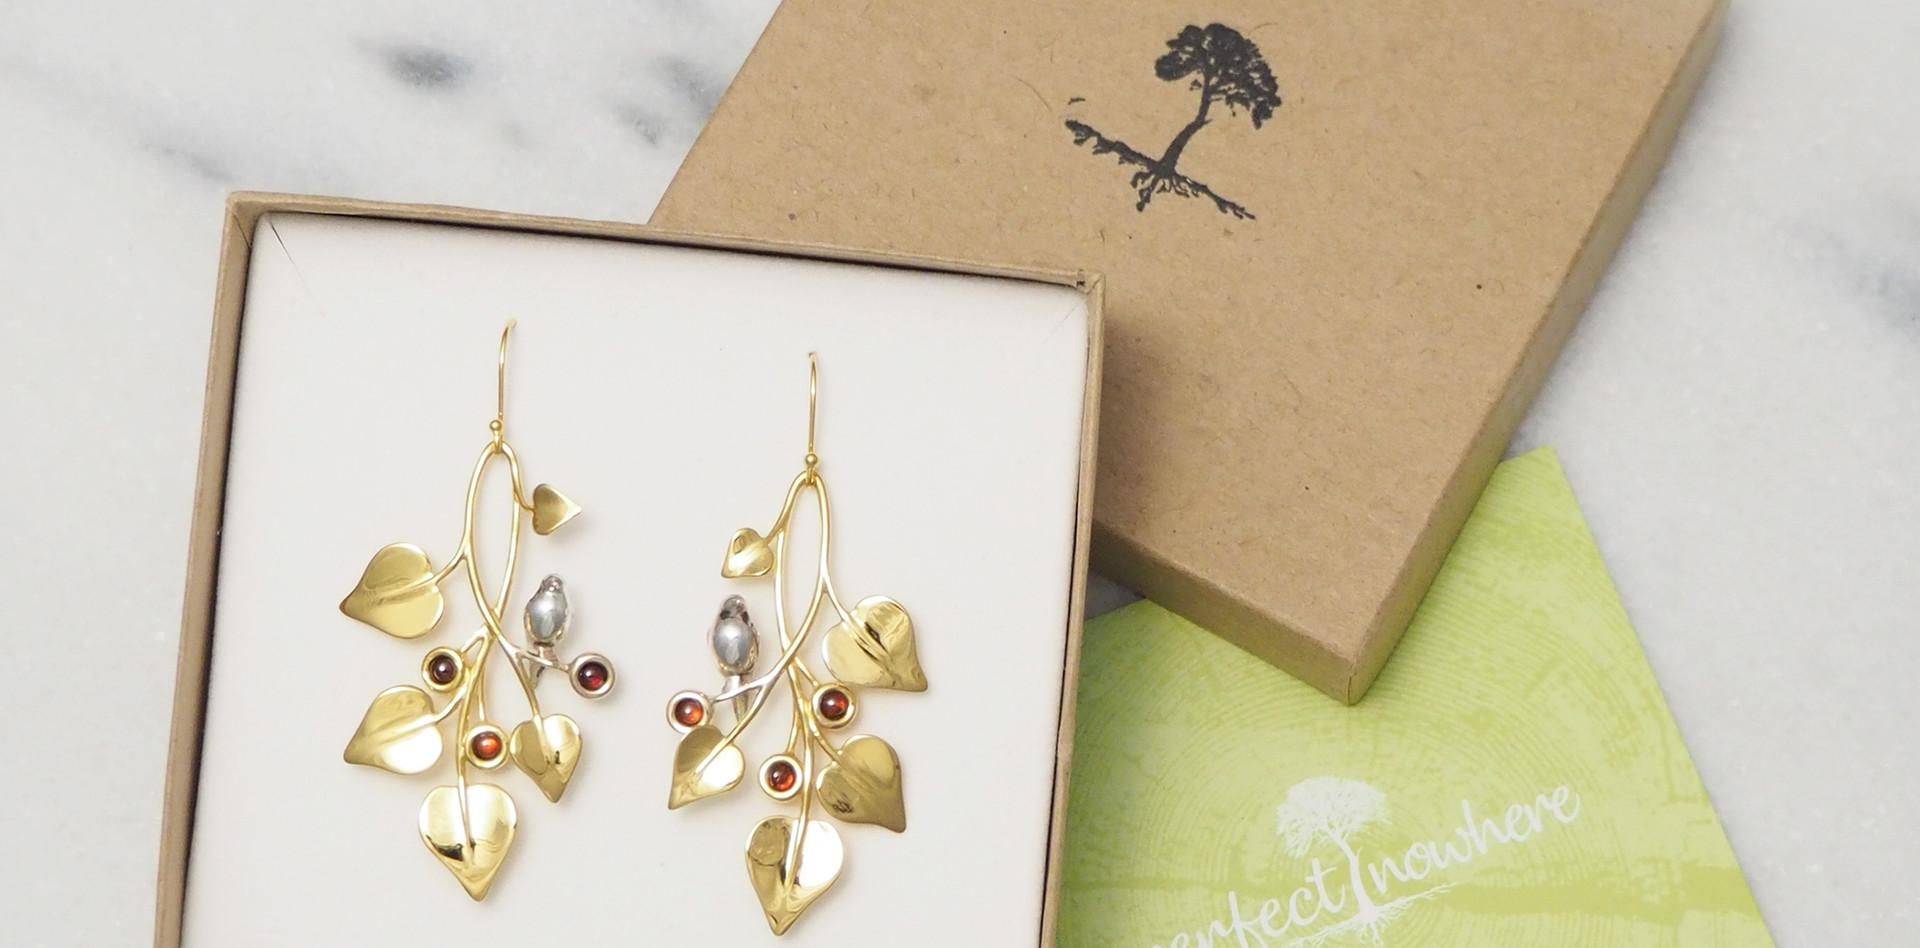 Doves in Draping Vines, Earrings-packaging